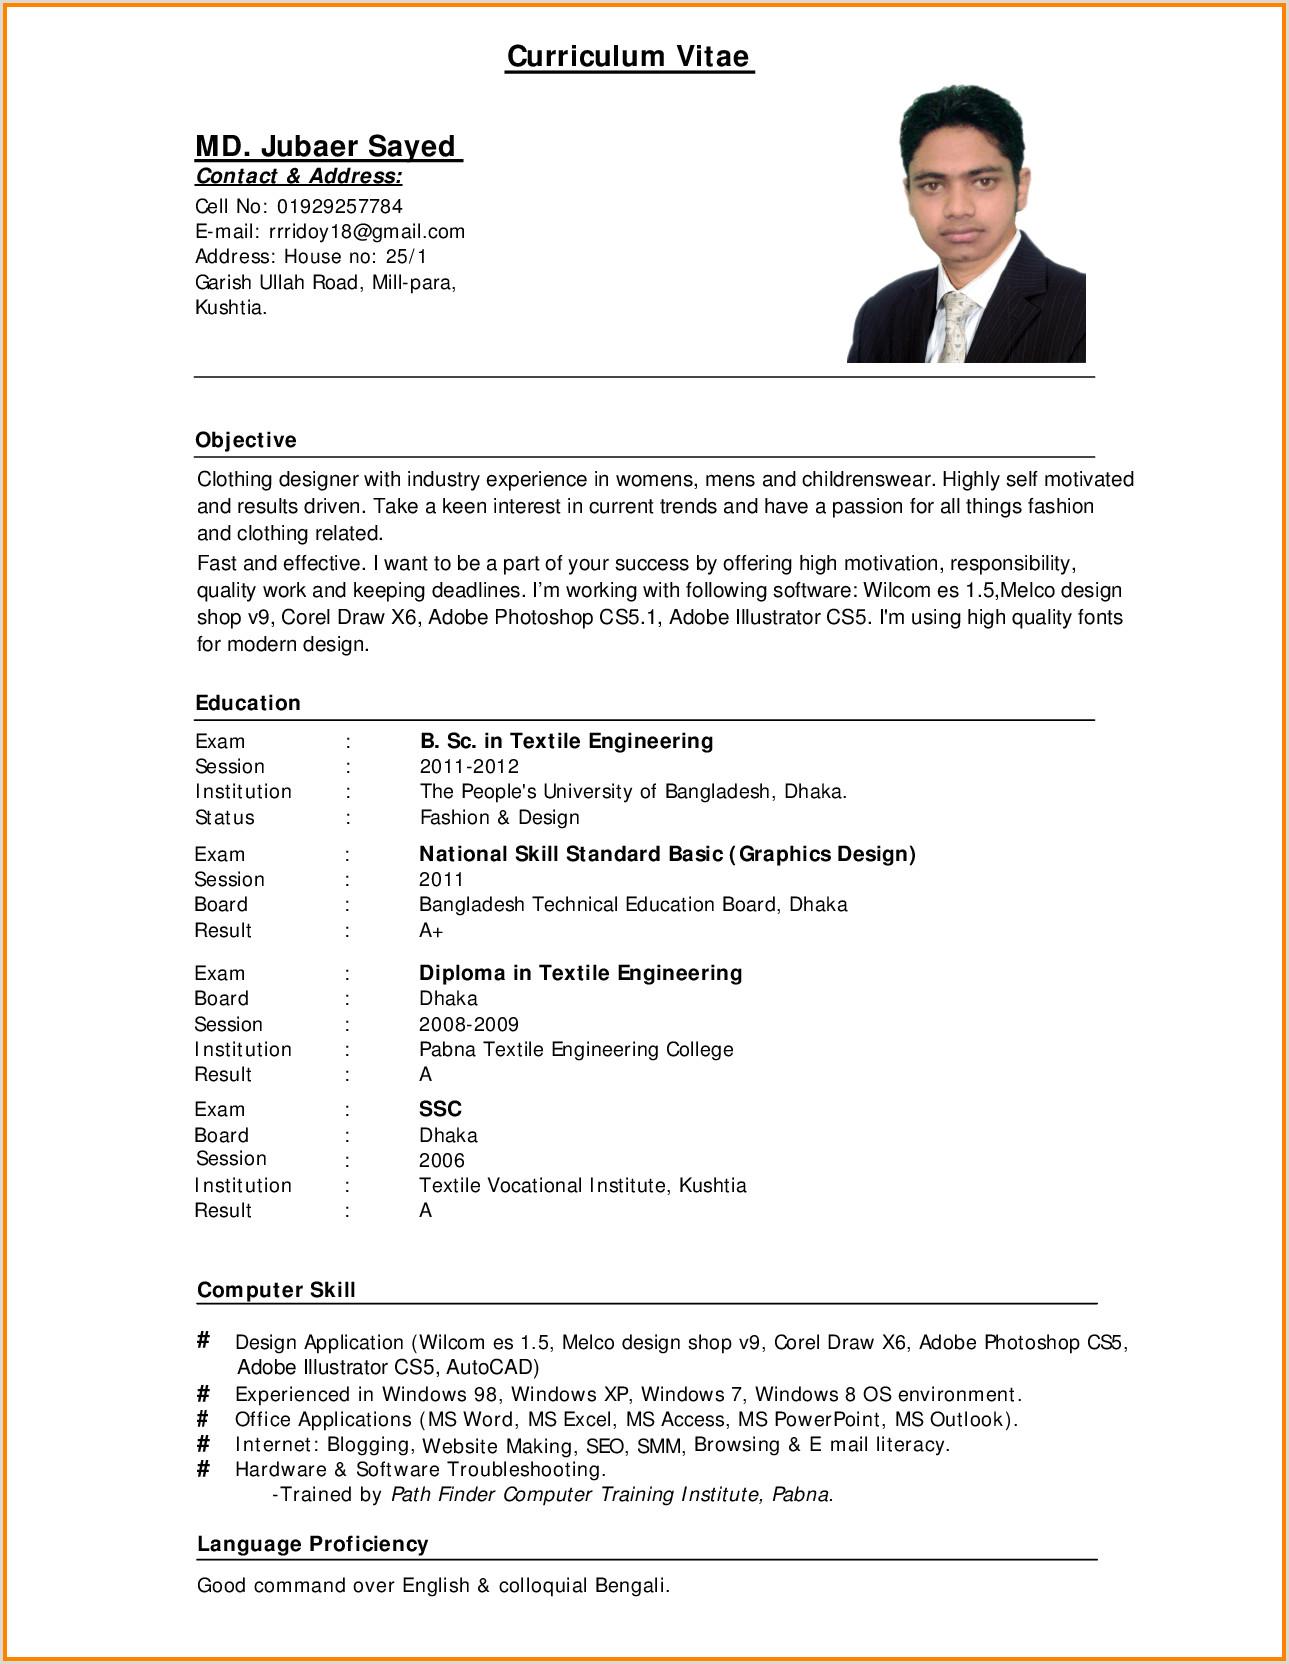 Cv format for Jobs In India Standard Cv format Bangladesh Professional Resumes Sample